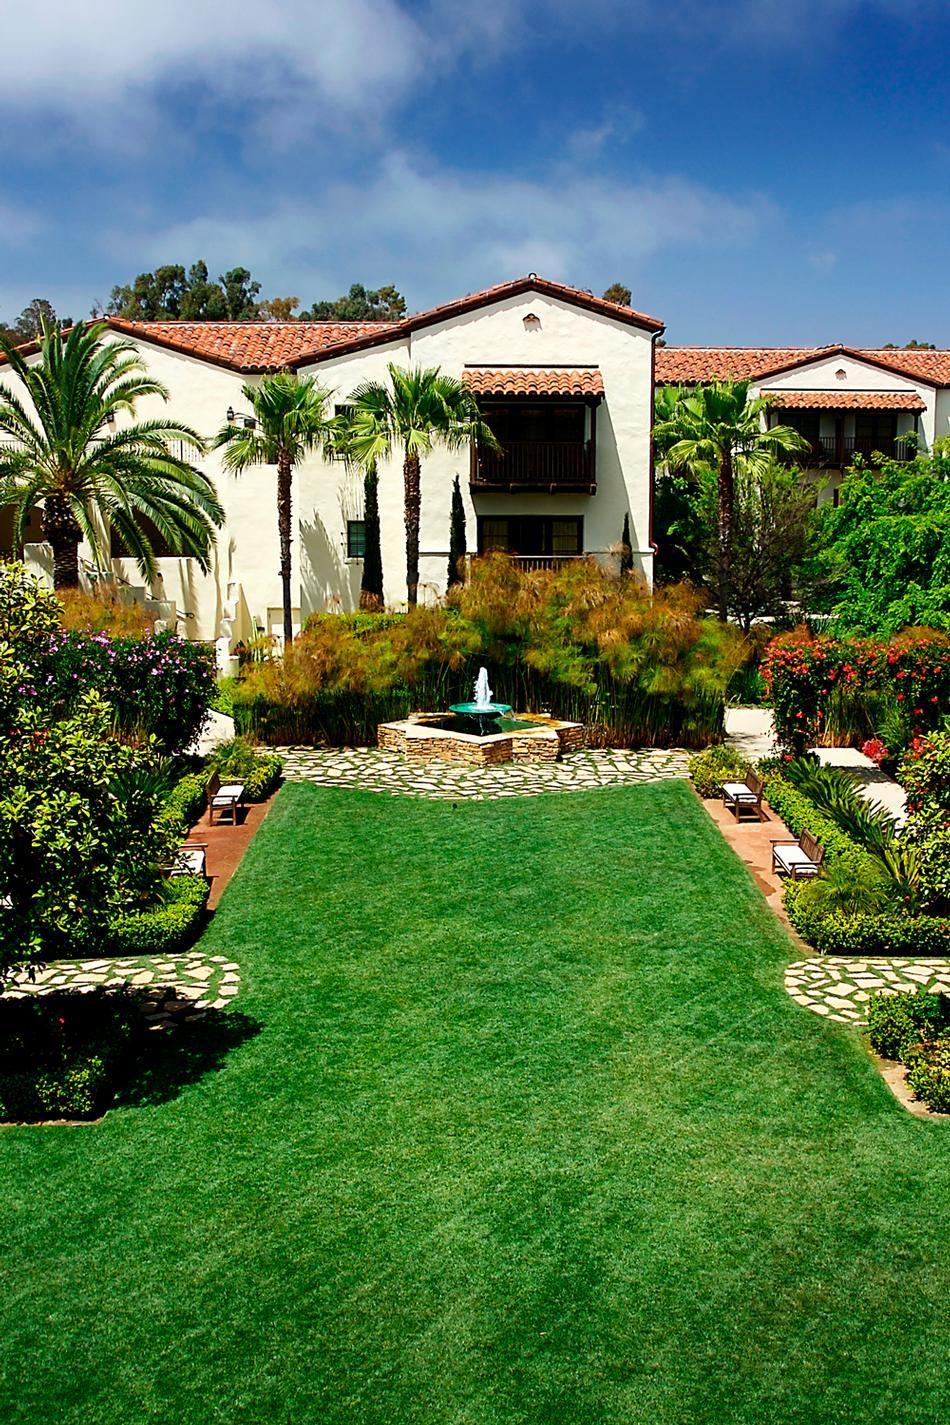 25 Best Weekend Getaways From San Diego, California (With